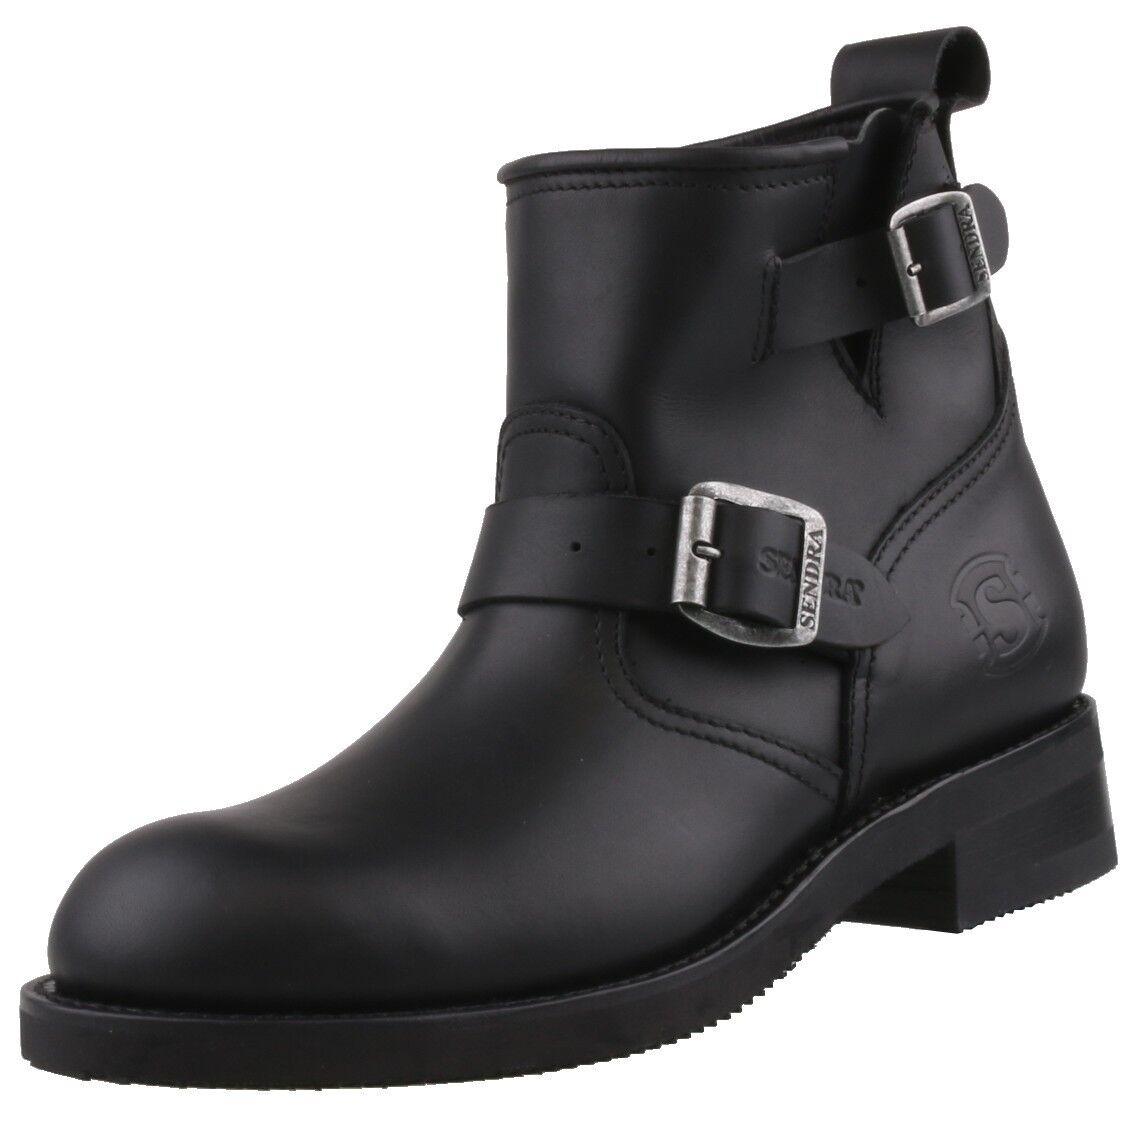 Nuevo sendra botas Biker-botas botín zapatos 2976 negro